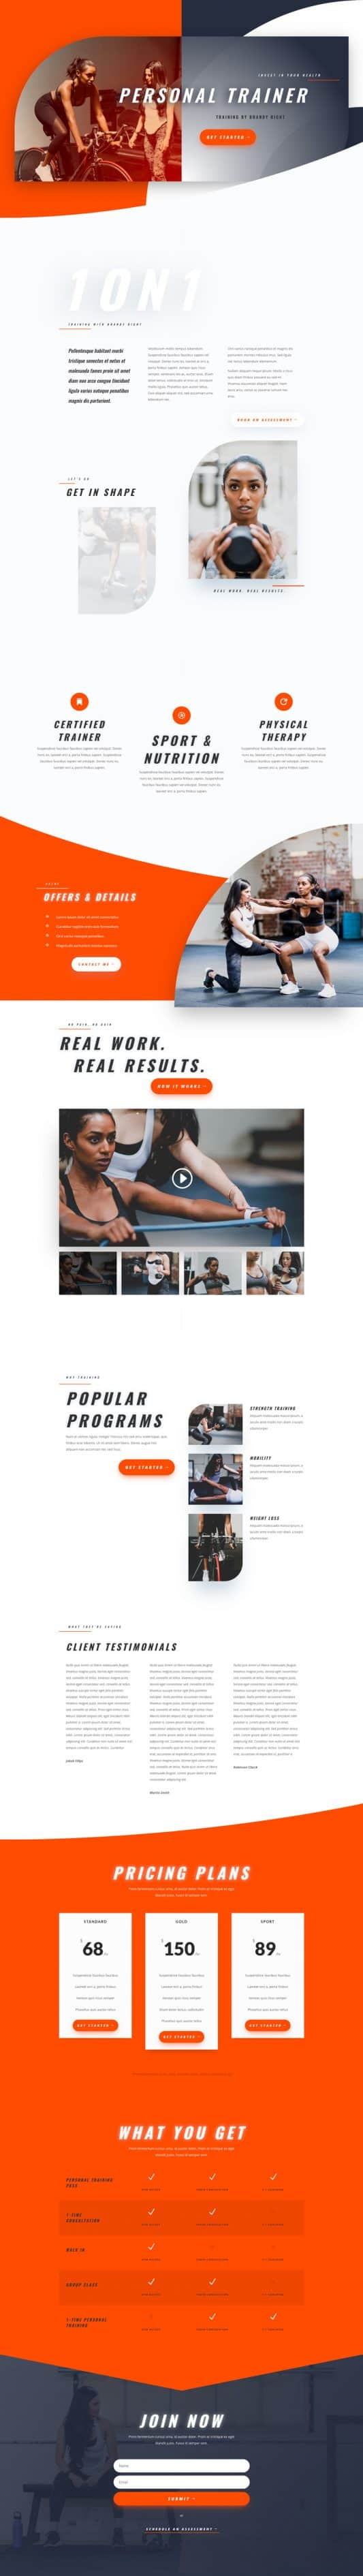 Personal Trainer Web Design 5